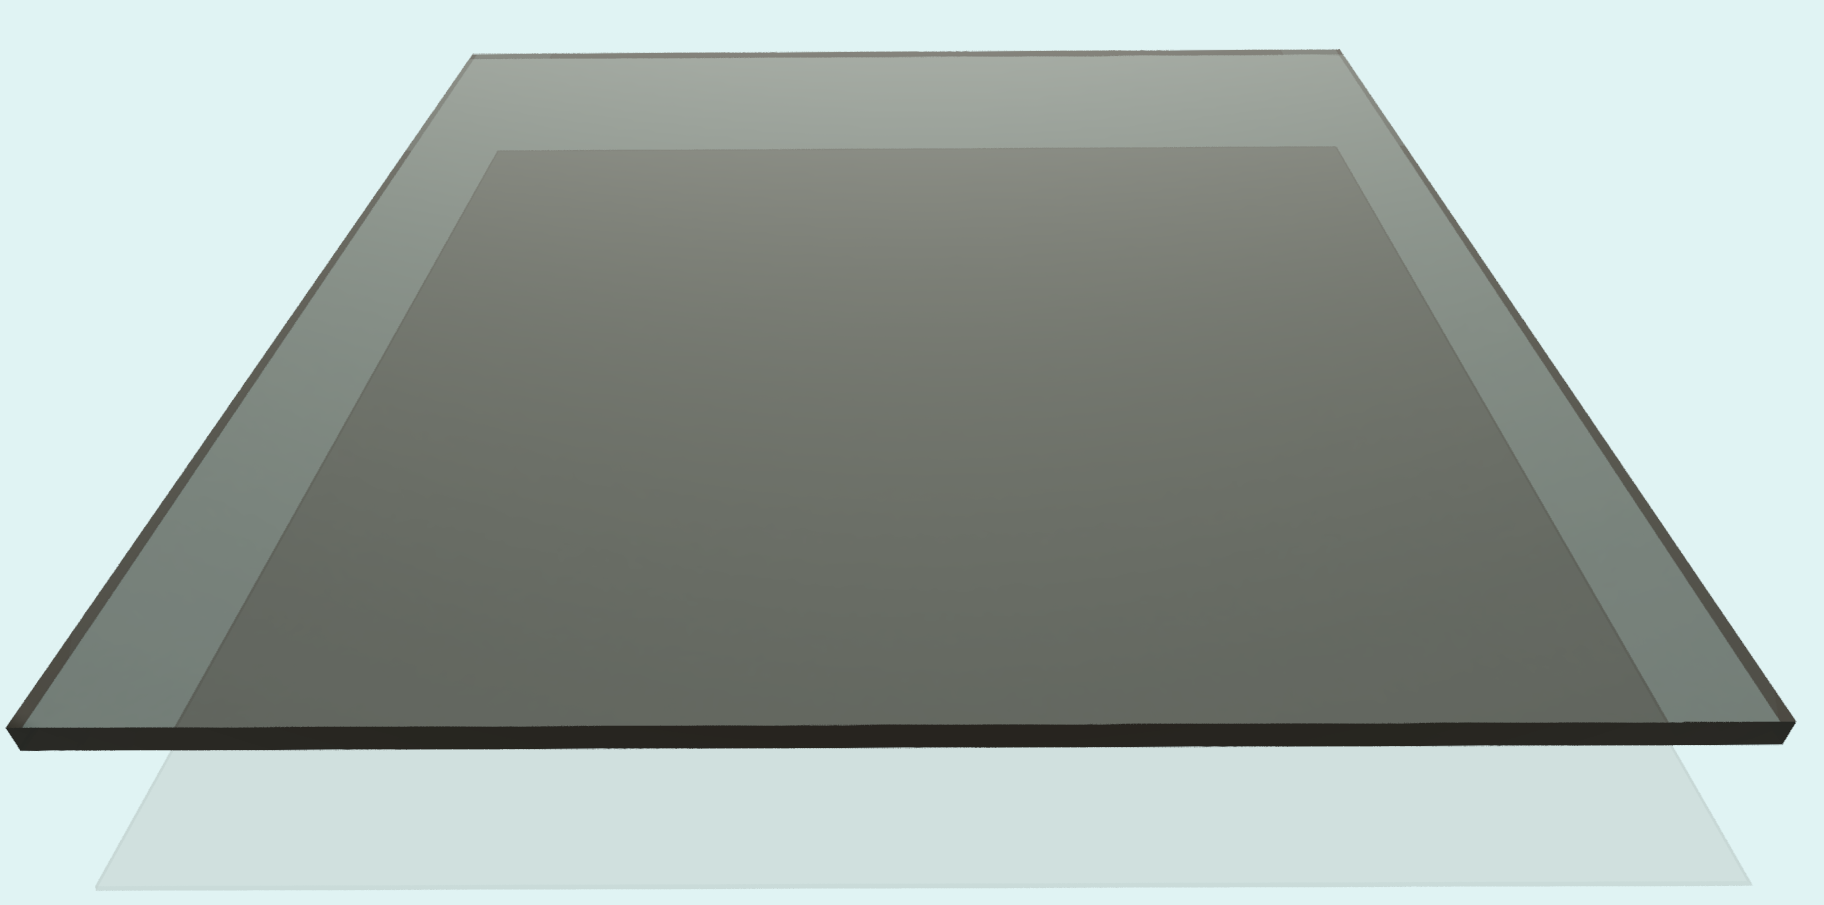 Plexiglas 4 mm, rauchfarben